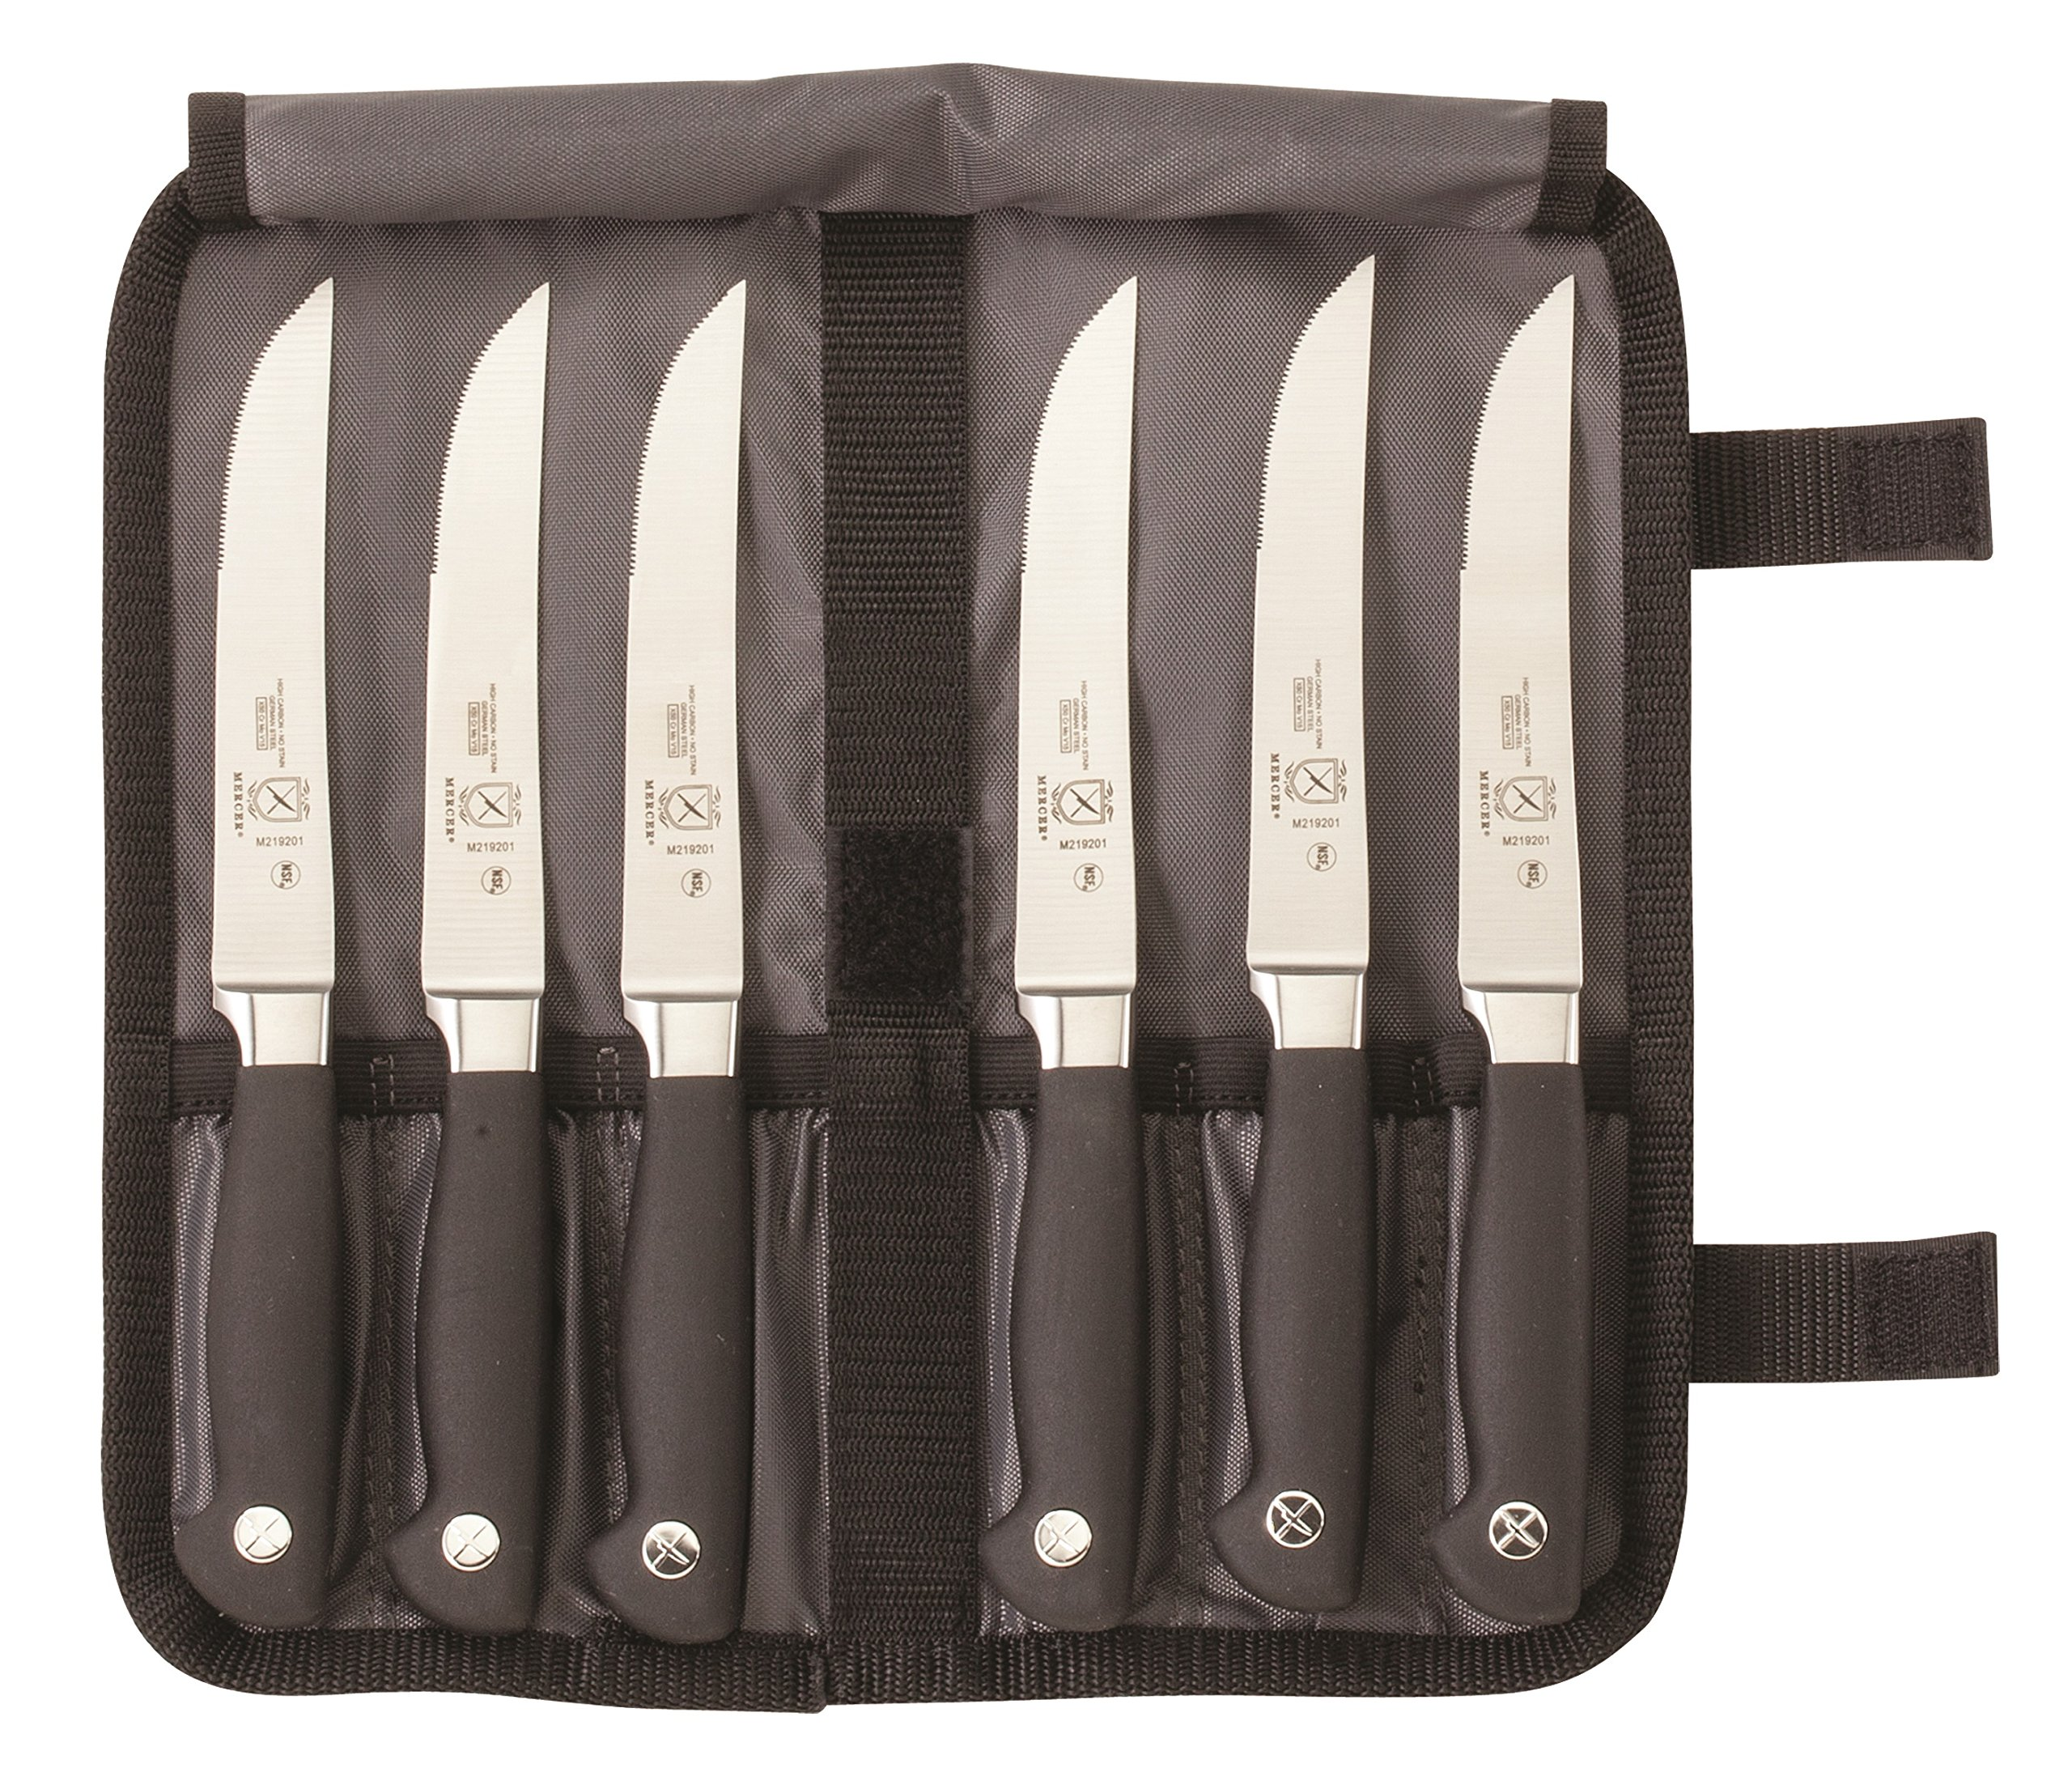 Mercer Culinary Genesis 7-Piece Forged Steak Knife Set